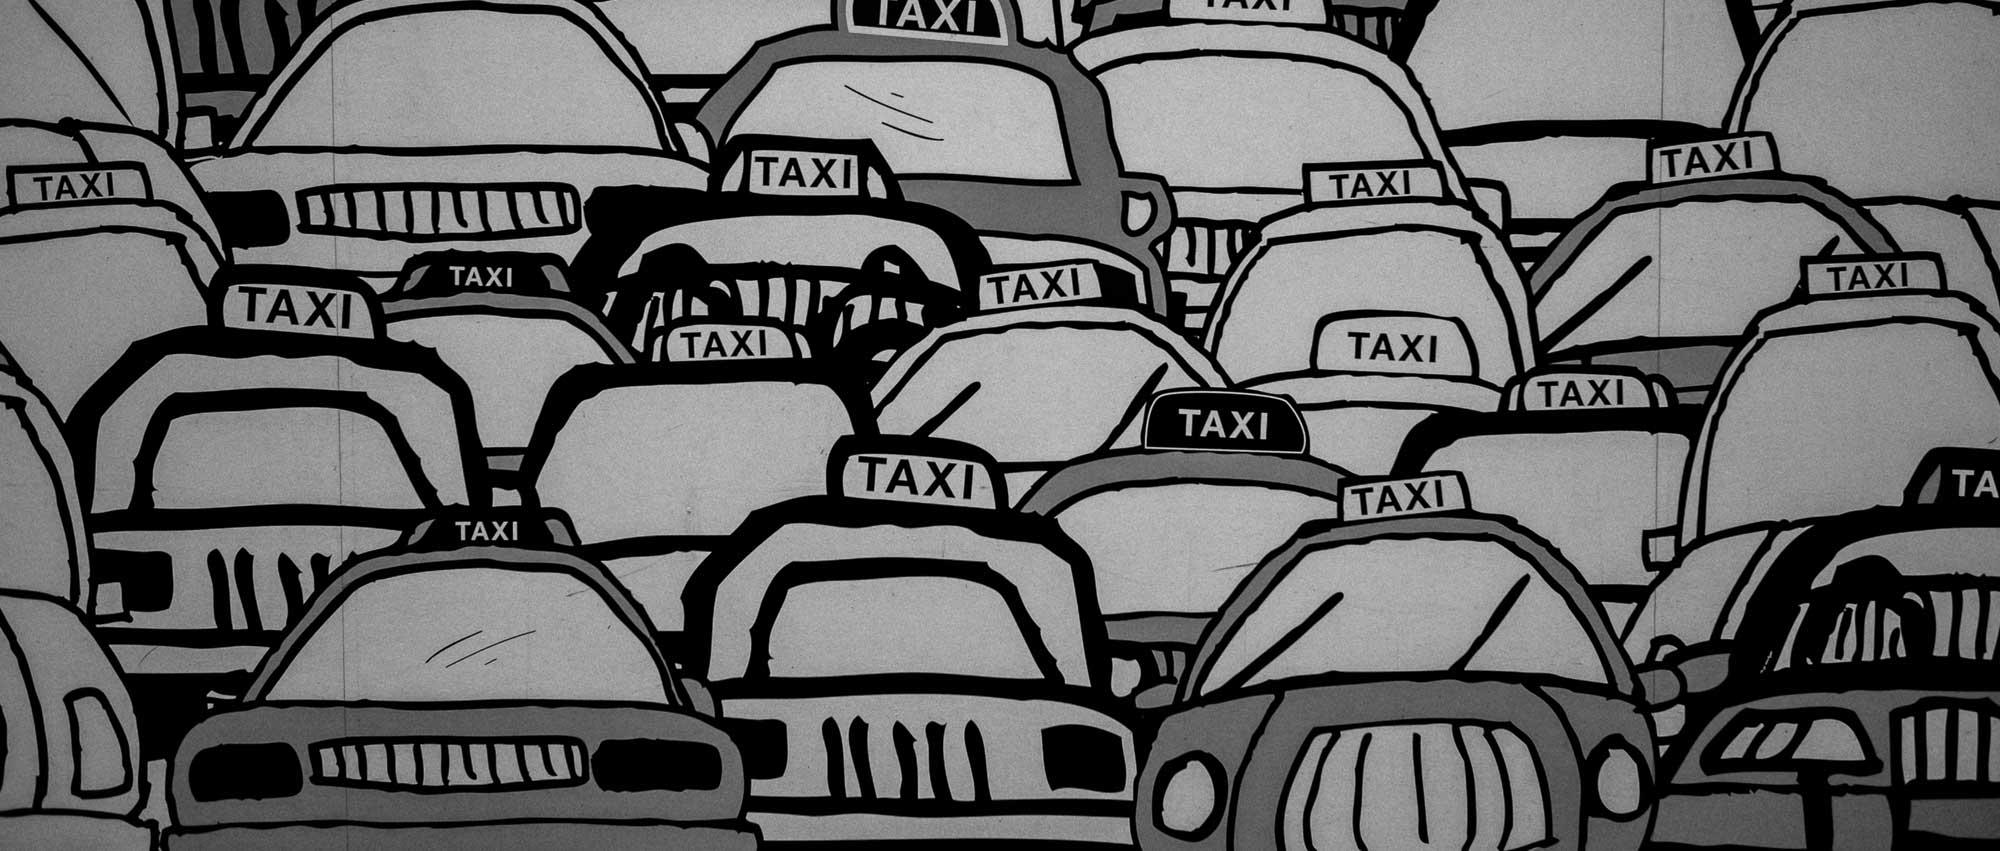 reise bericht new york gotham taxi taxi